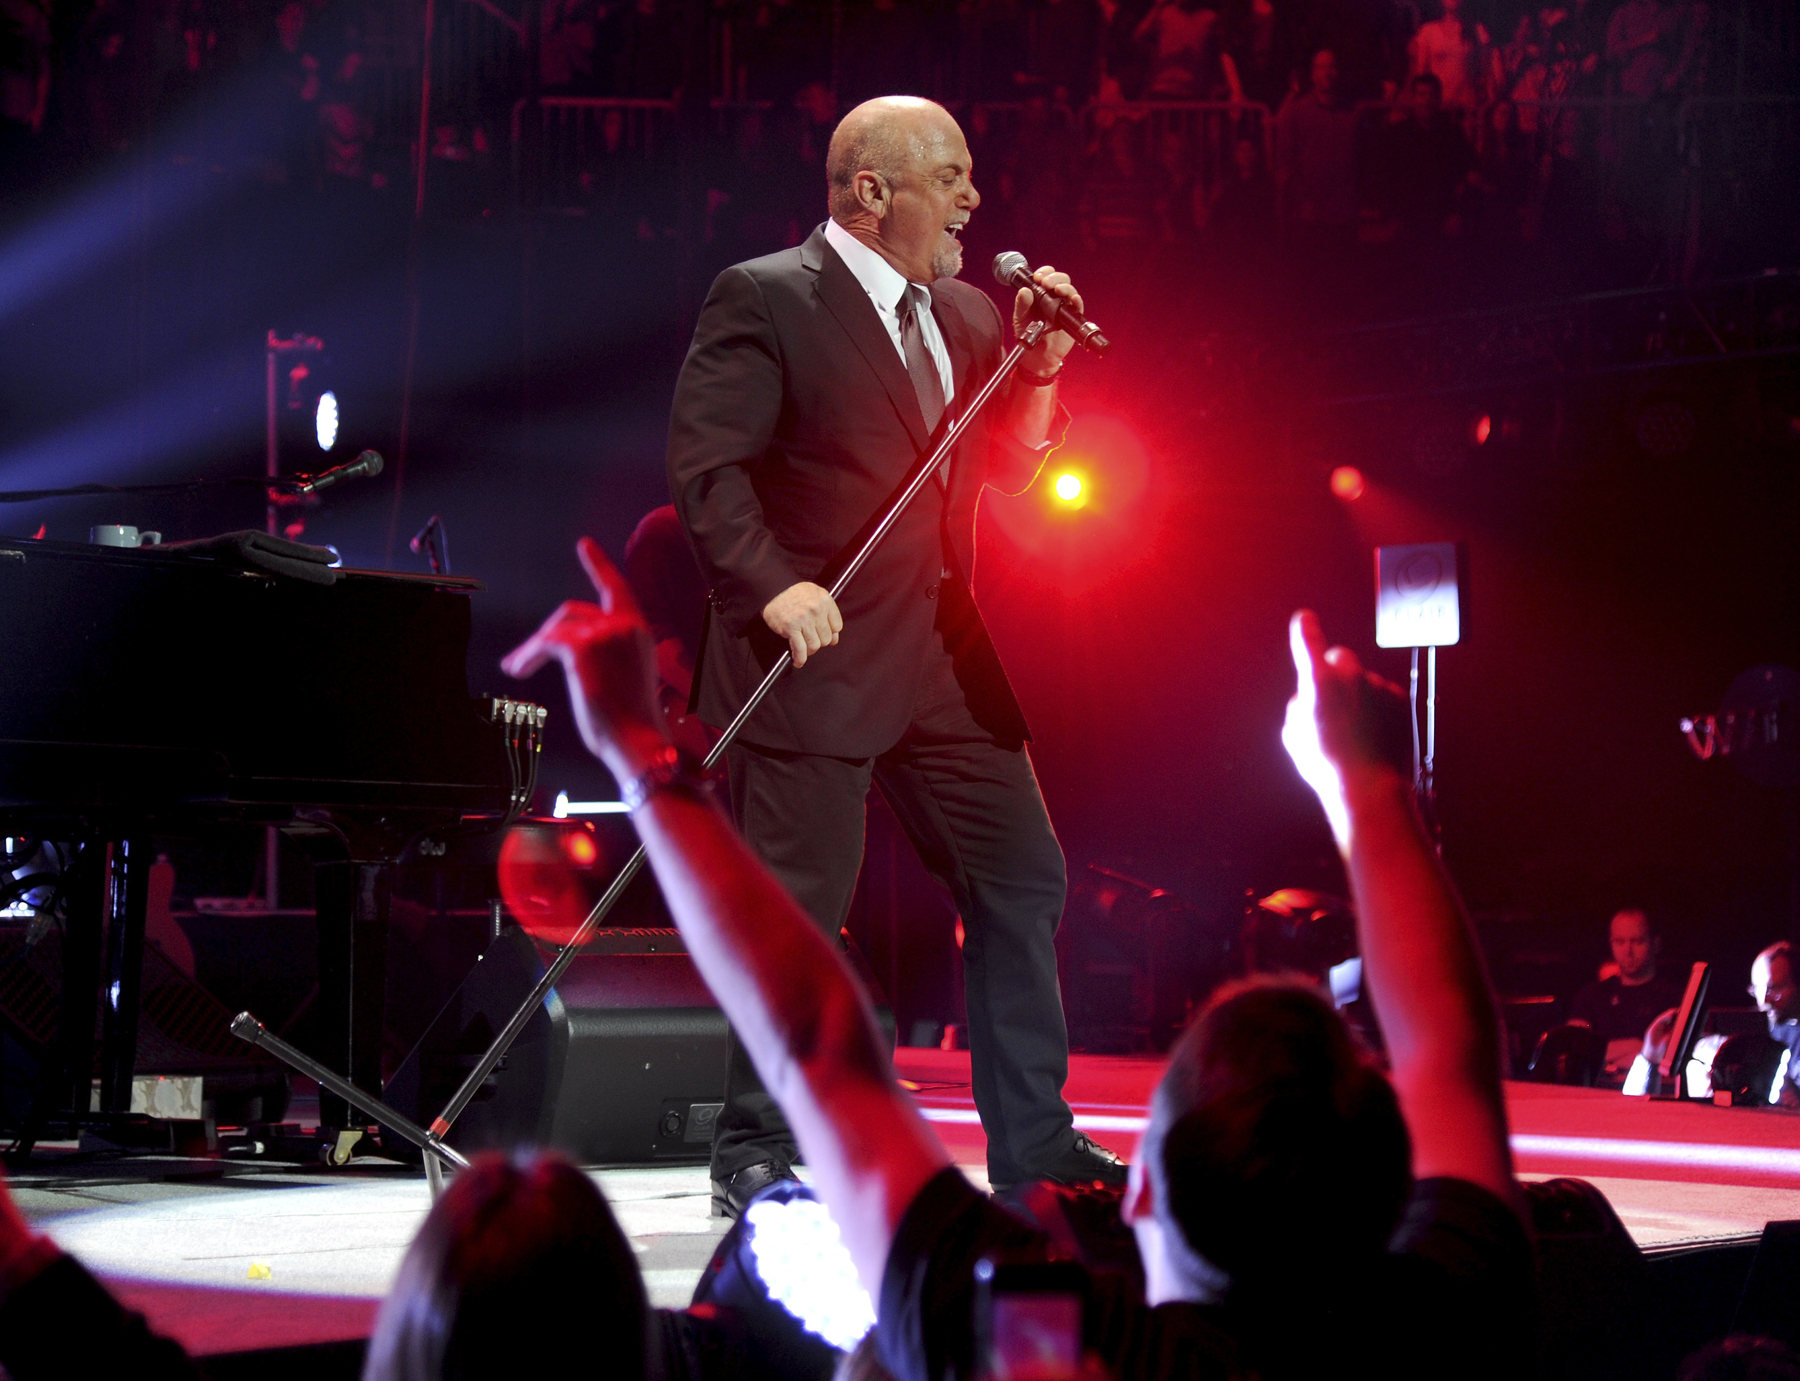 Billy Joel Leads Hometown Sing-Alongs at New Year's Show in Brooklyn